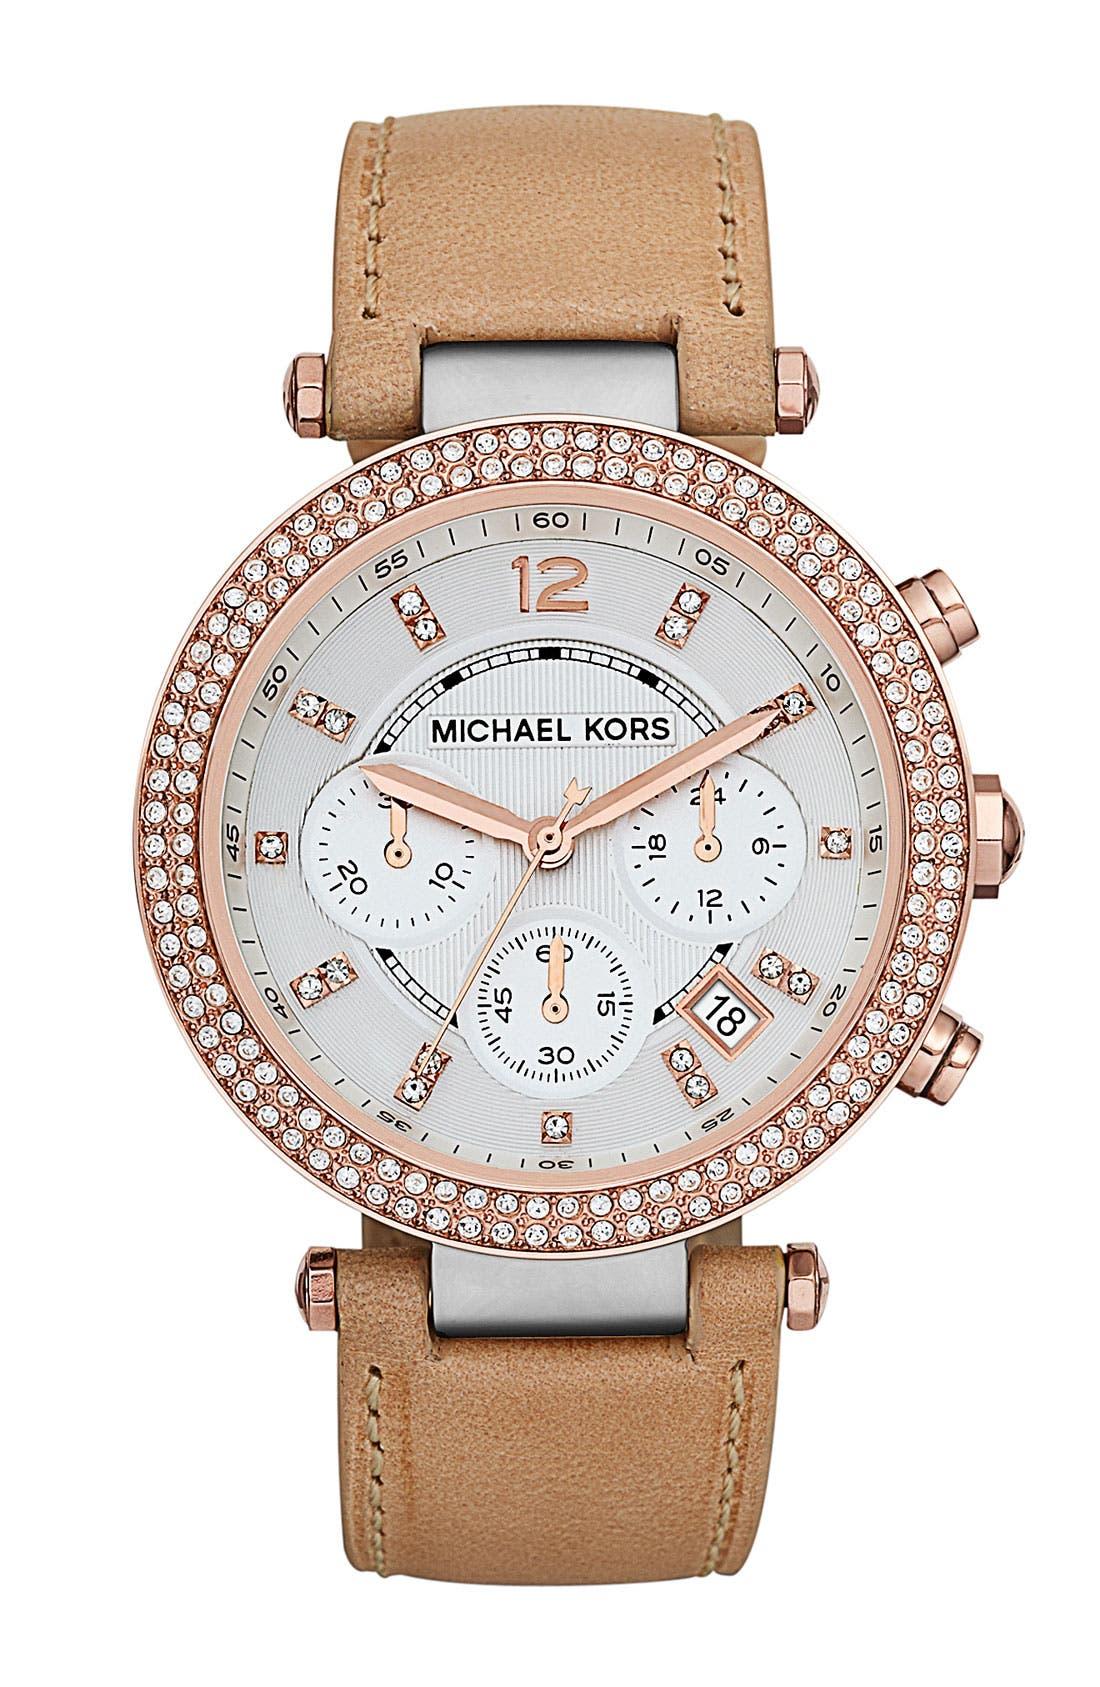 Main Image - Michael Kors 'Parker' Chronograph Leather Watch